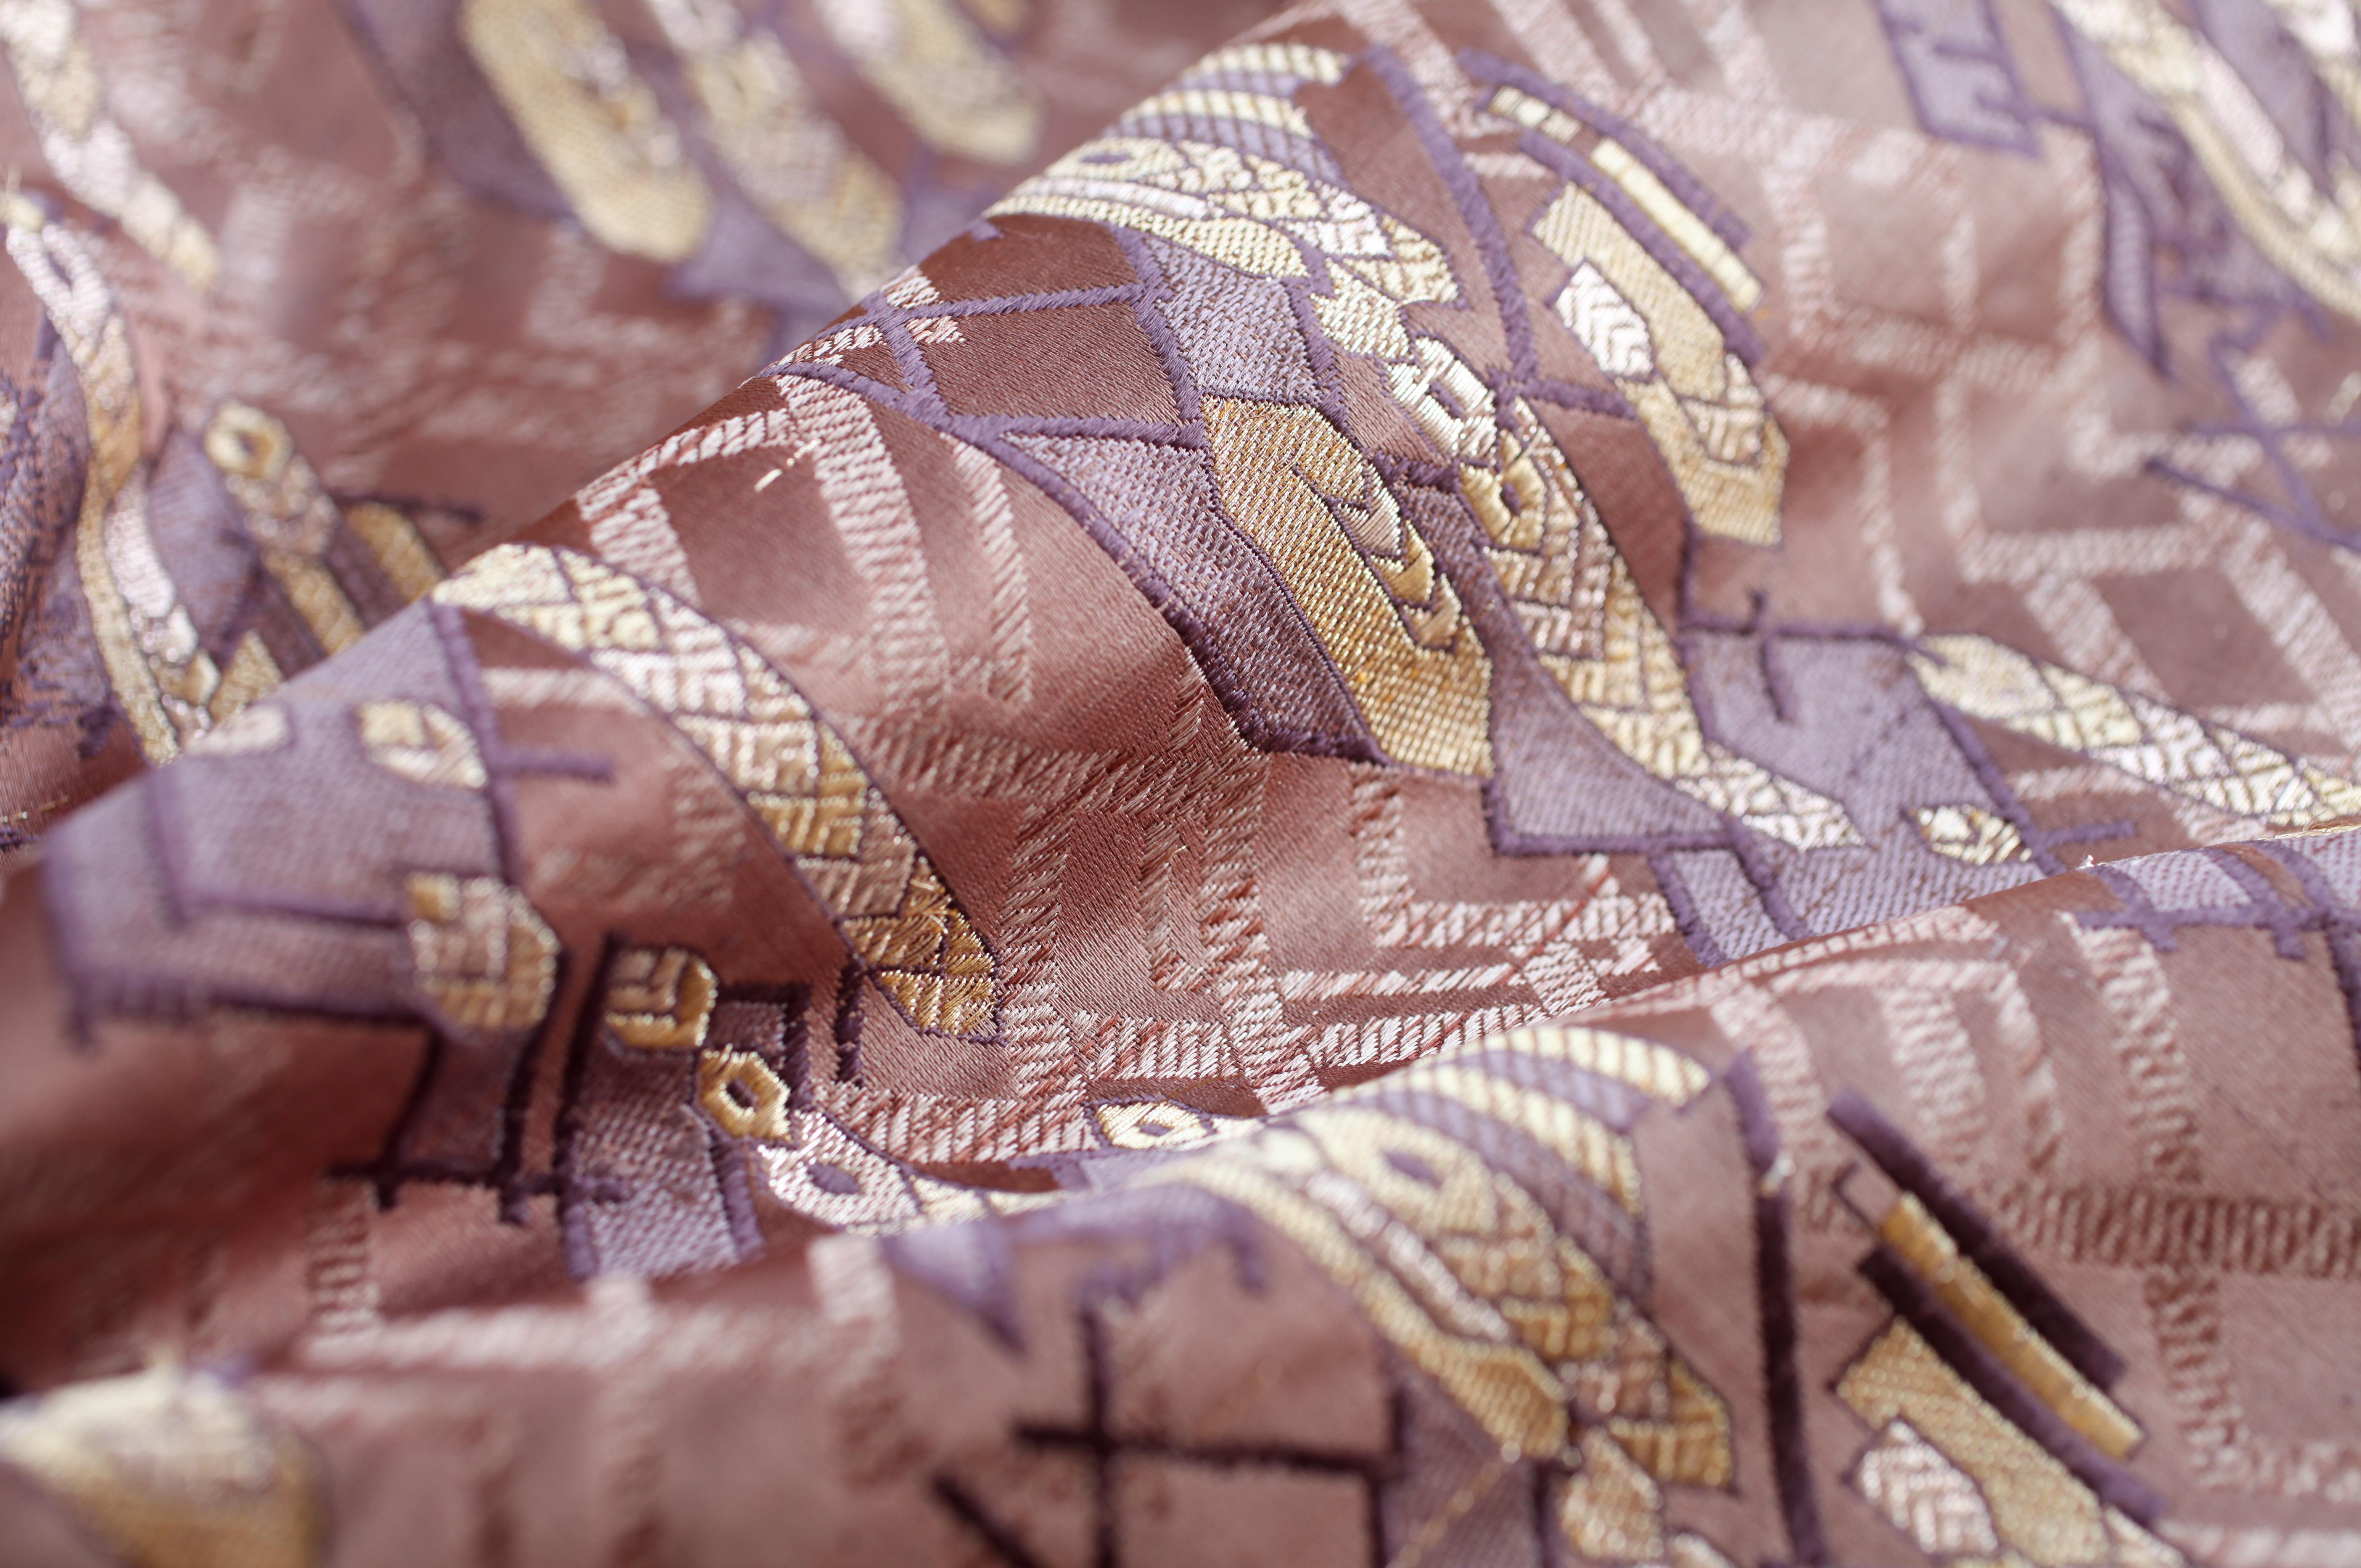 From Indian Villages To West Elm Shelves: Handmade Crafts Go High-End